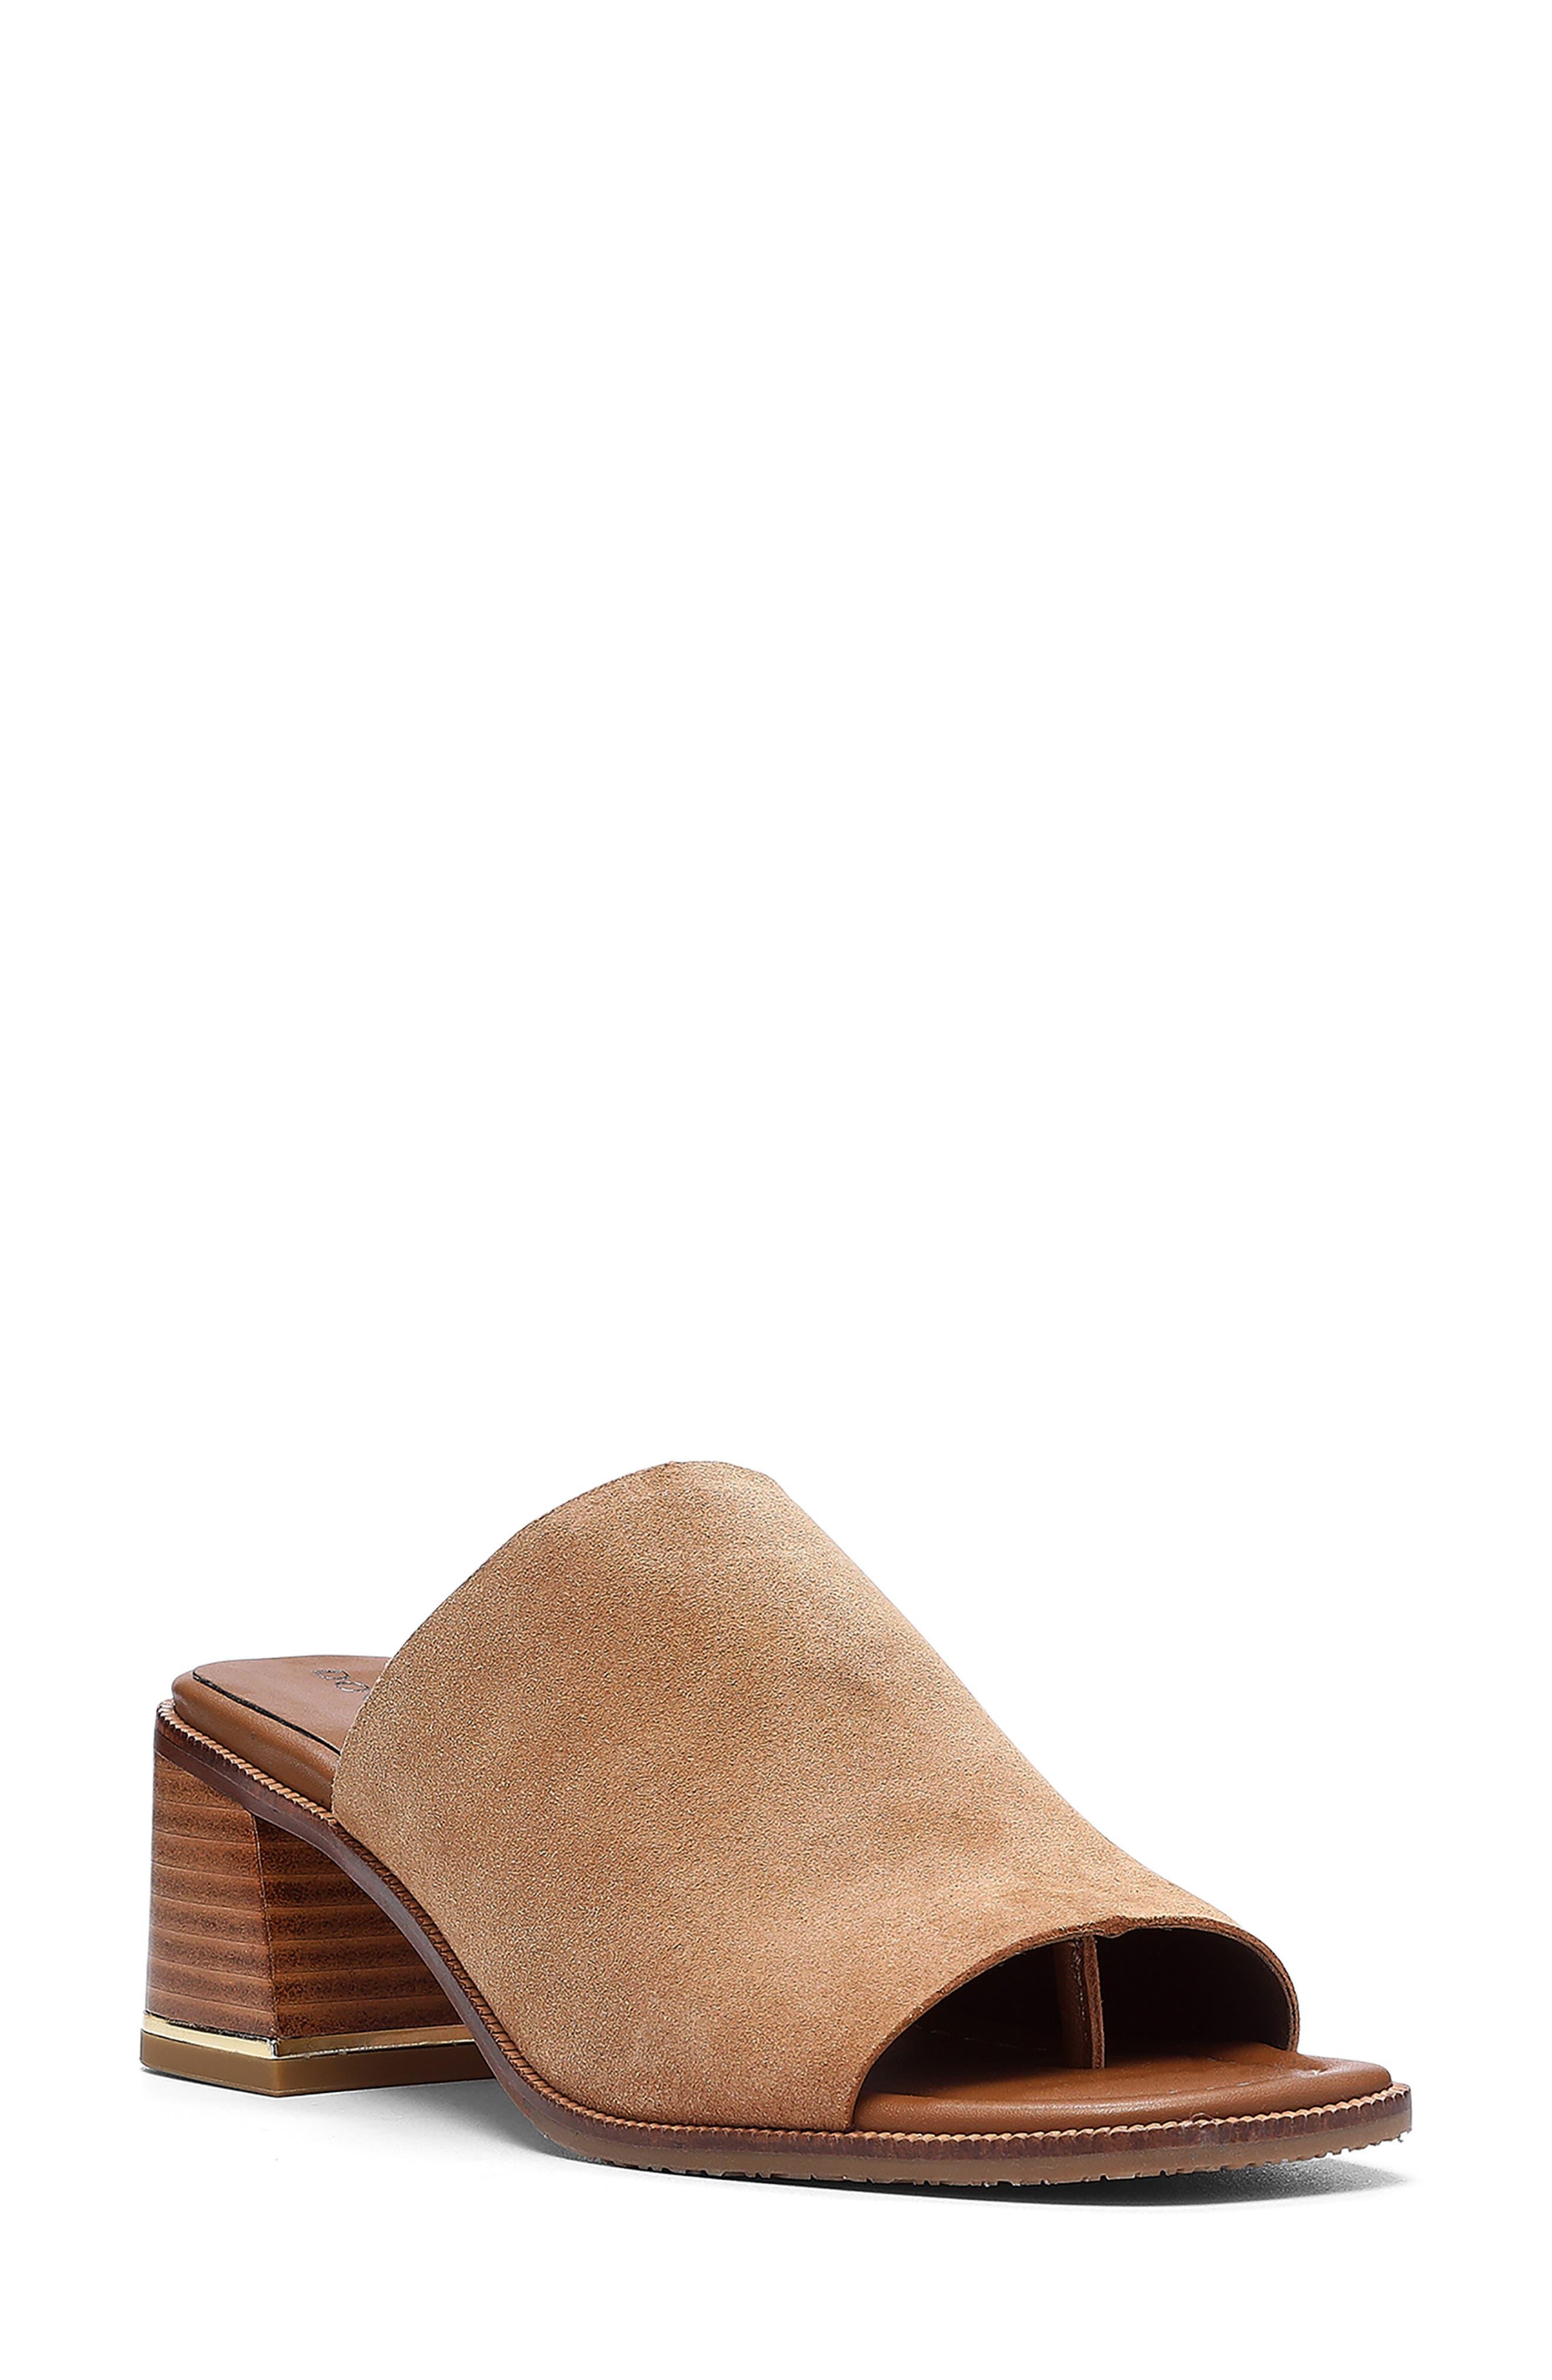 Haze Thong Slide Sandal